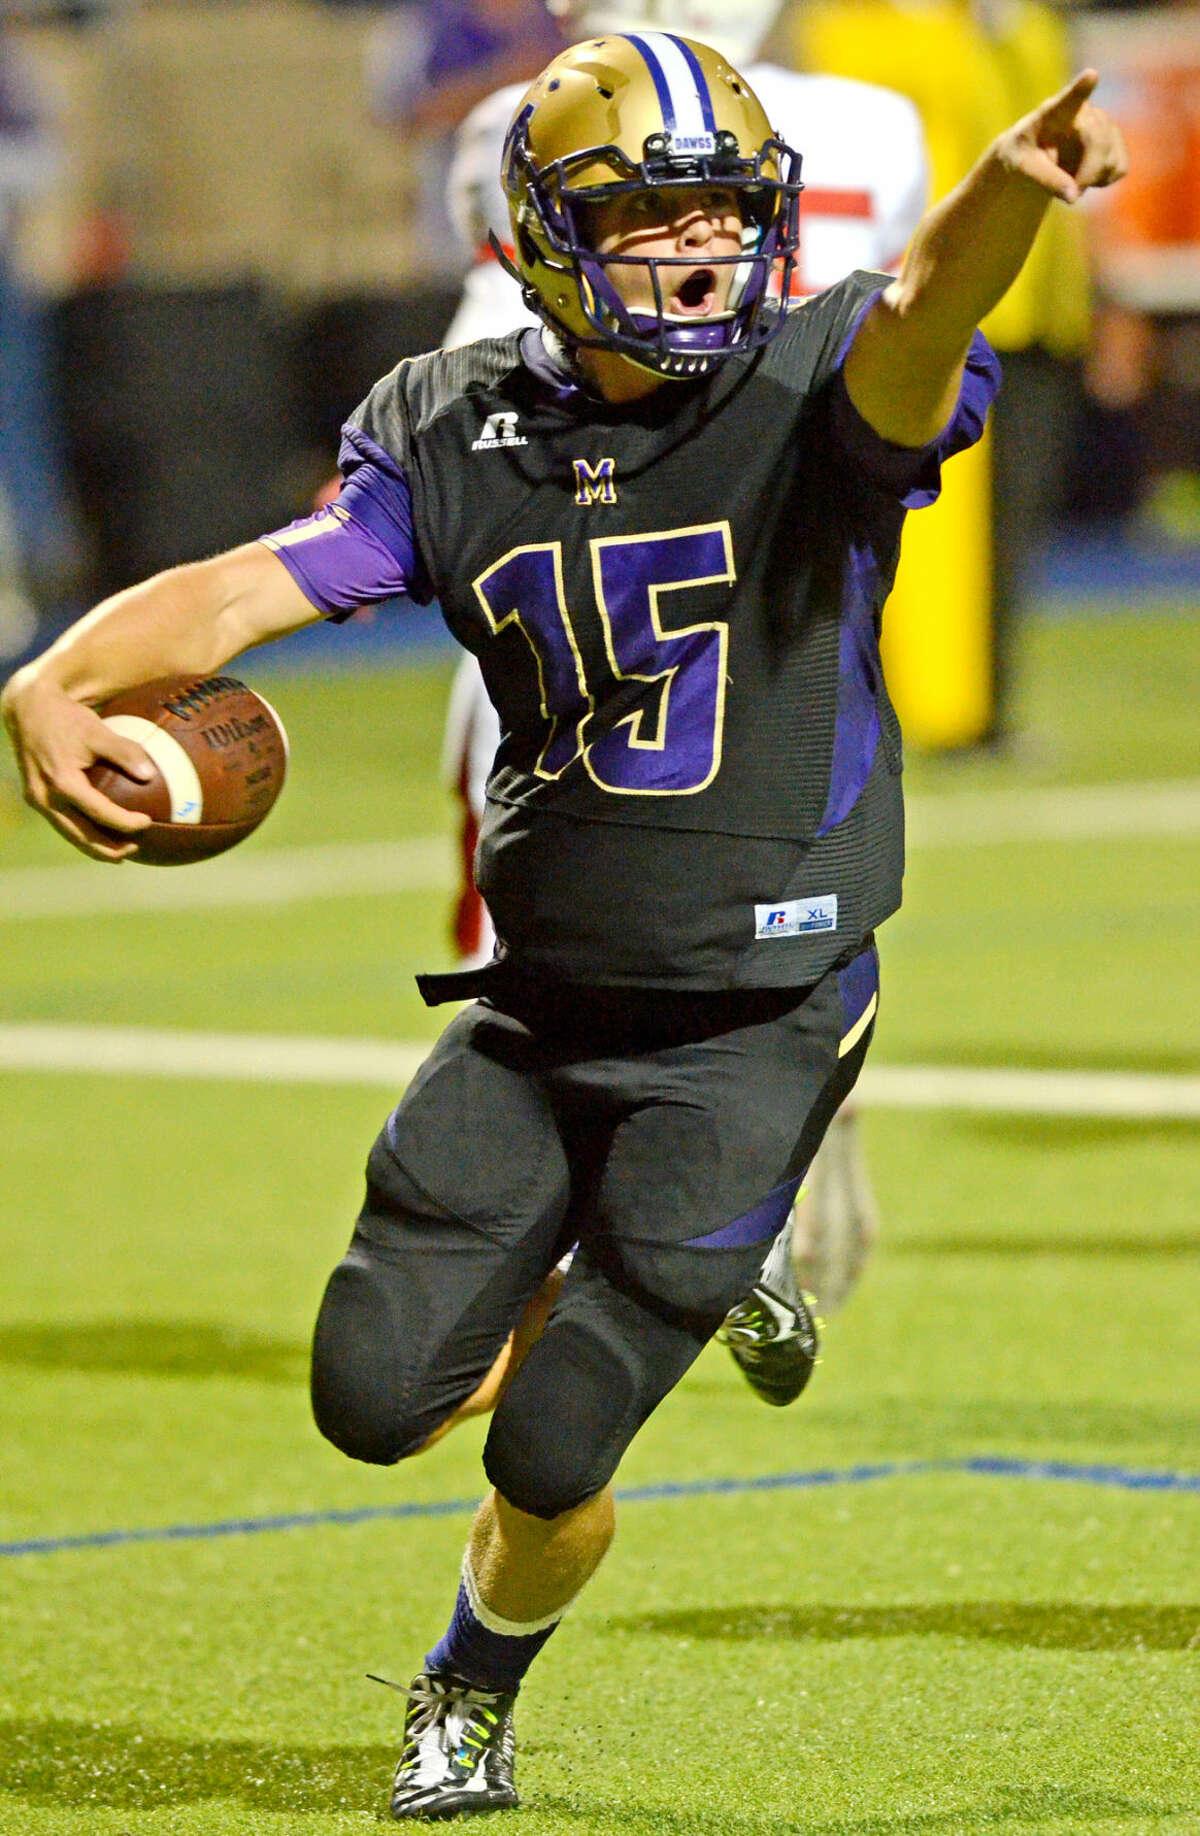 Midland High quarterback Jackson Anuszkiewicz (15) celebrates after scoring against Odessa High on Friday, Oct. 9, 2015, at Grande Communications Stadium. James Durbin/Reporter-Telegram